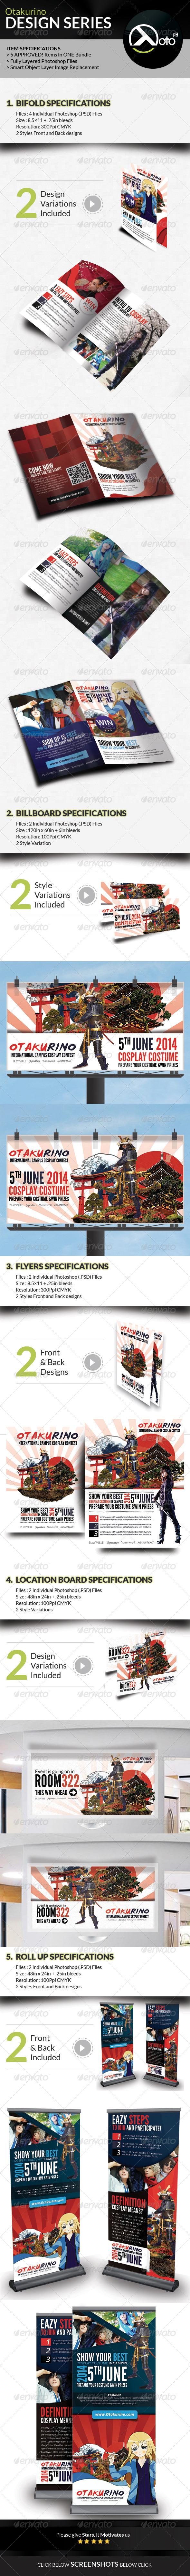 GraphicRiver Otakurino Cosplay Contest Design Series Bundle 7789220